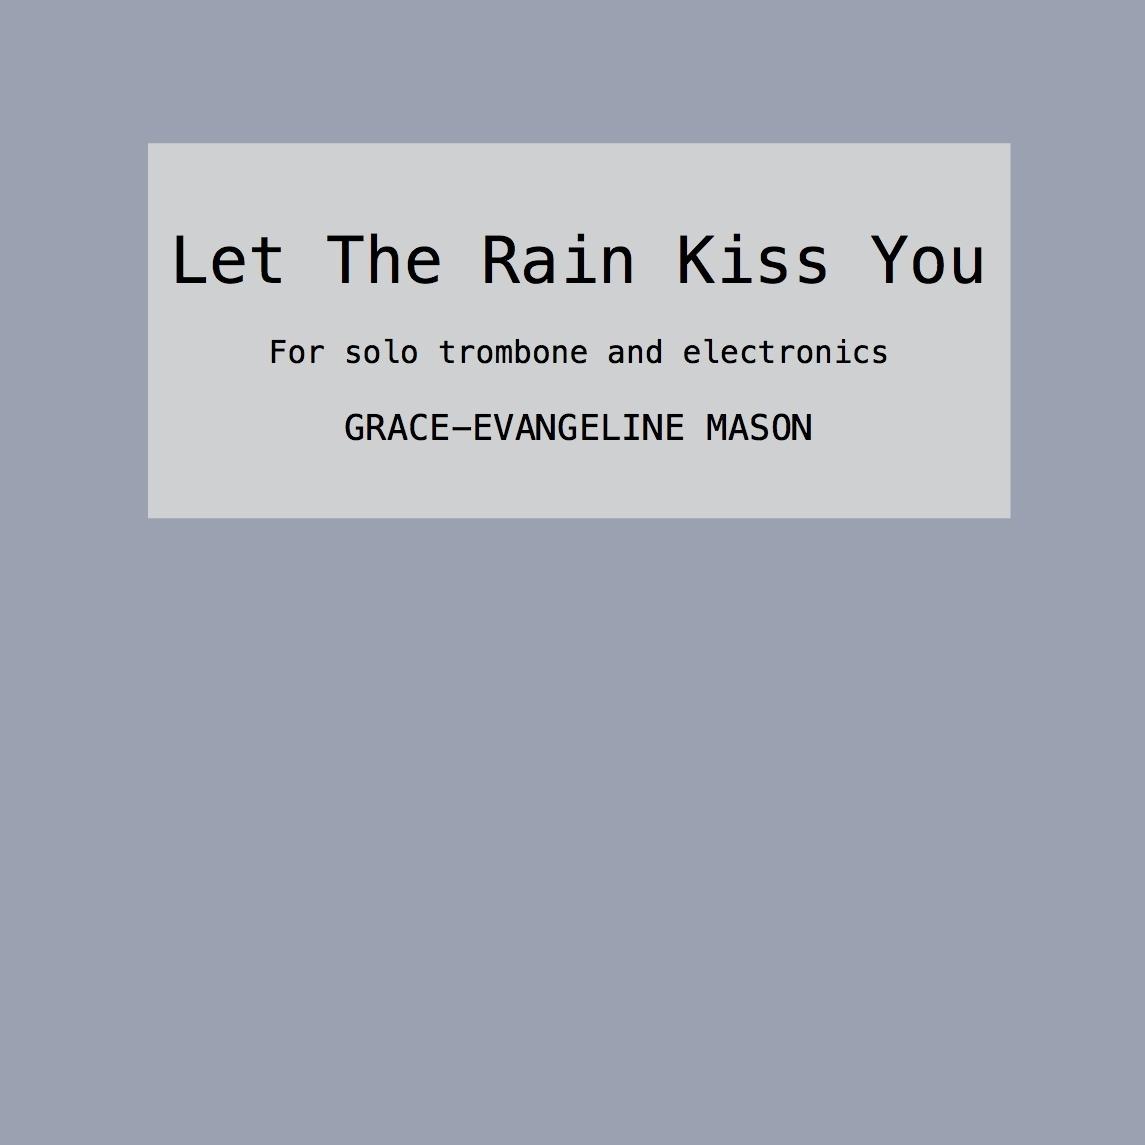 Let The Rain Kiss You (2015)